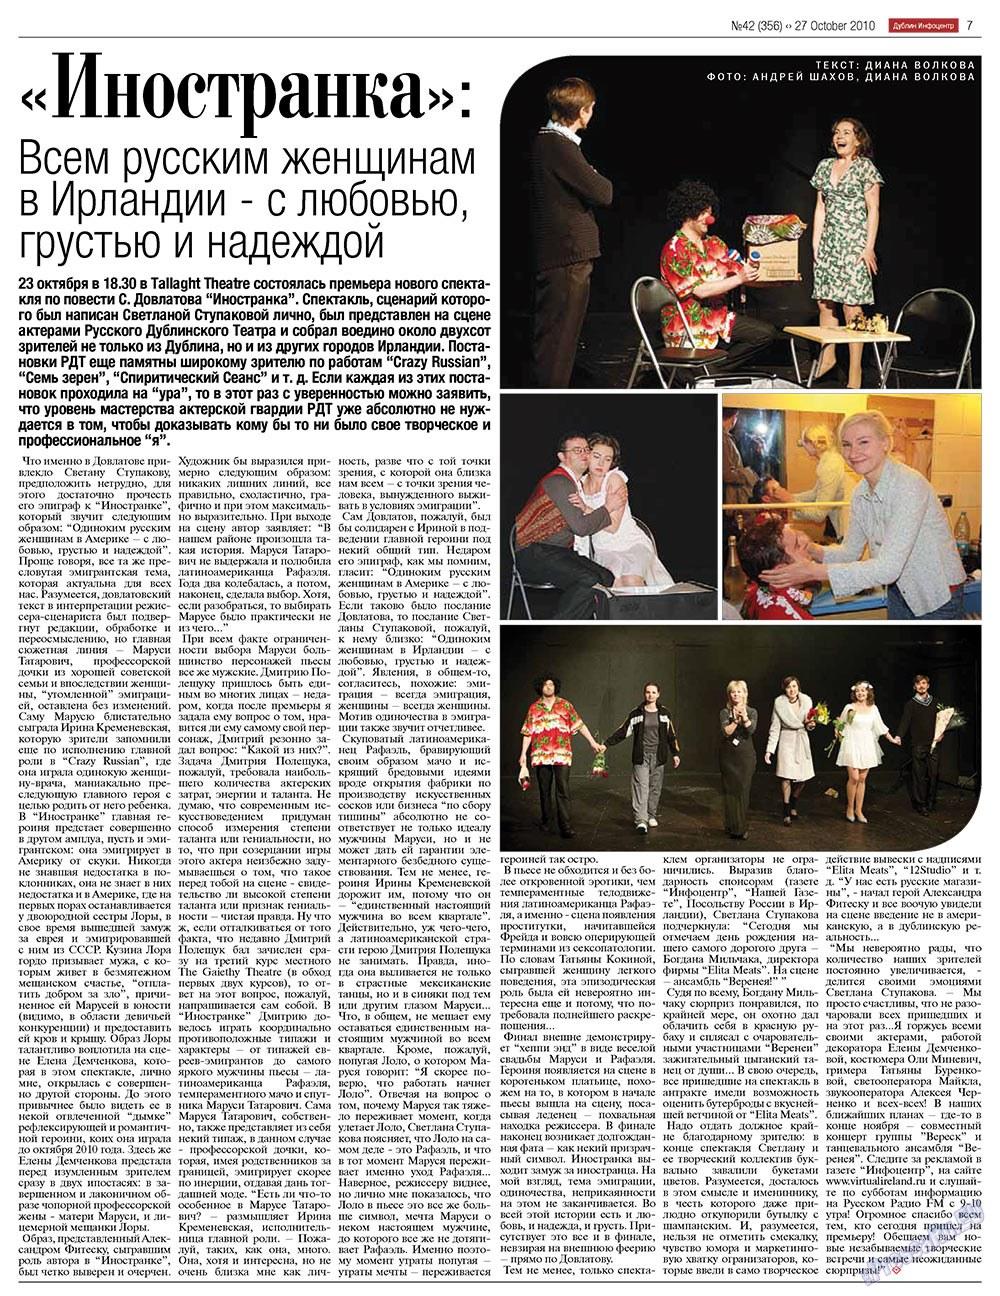 Дублин инфоцентр (газета). 2010 год, номер 42, стр. 7